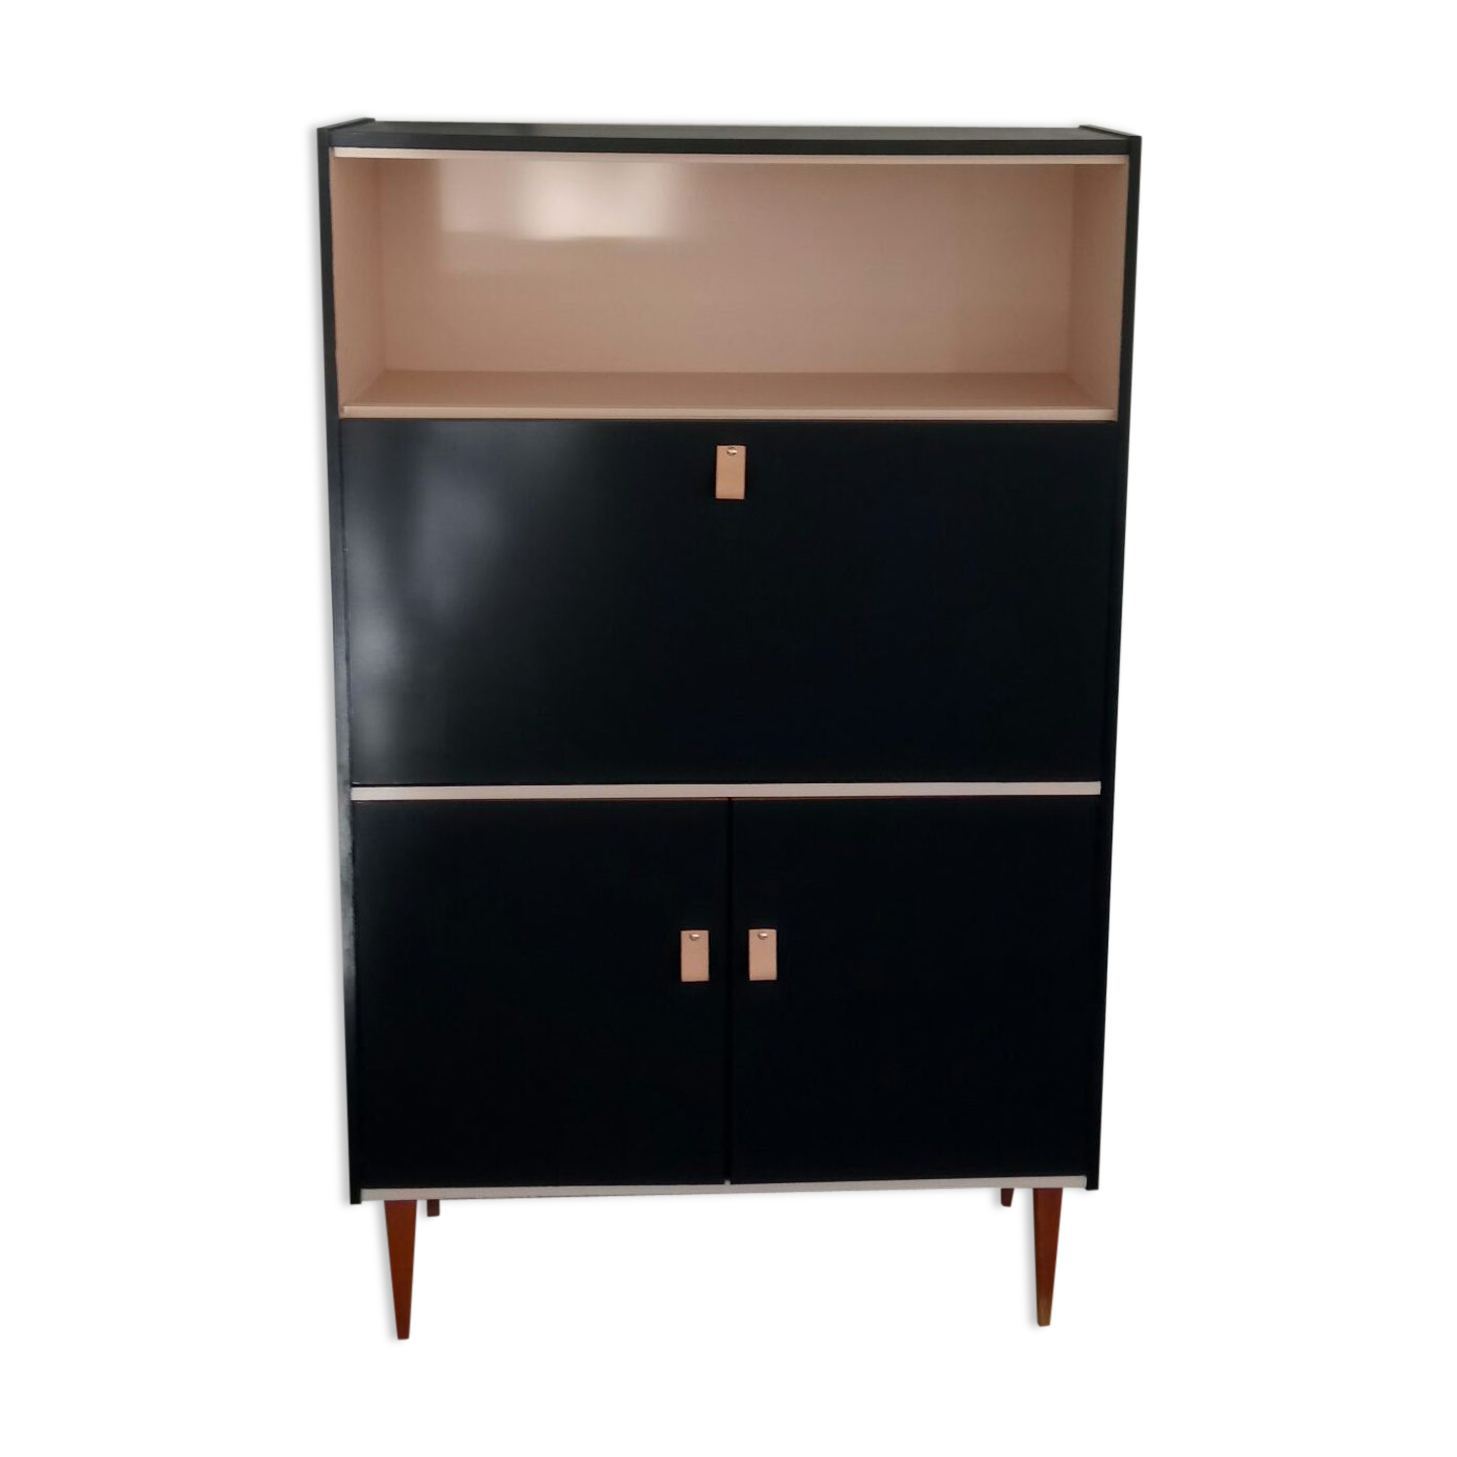 Renovated Office Vintage Secretary Wood Black Vintage 8xn5xsk Rh Selency Co  Uk Amish Furniture Secretary Desk